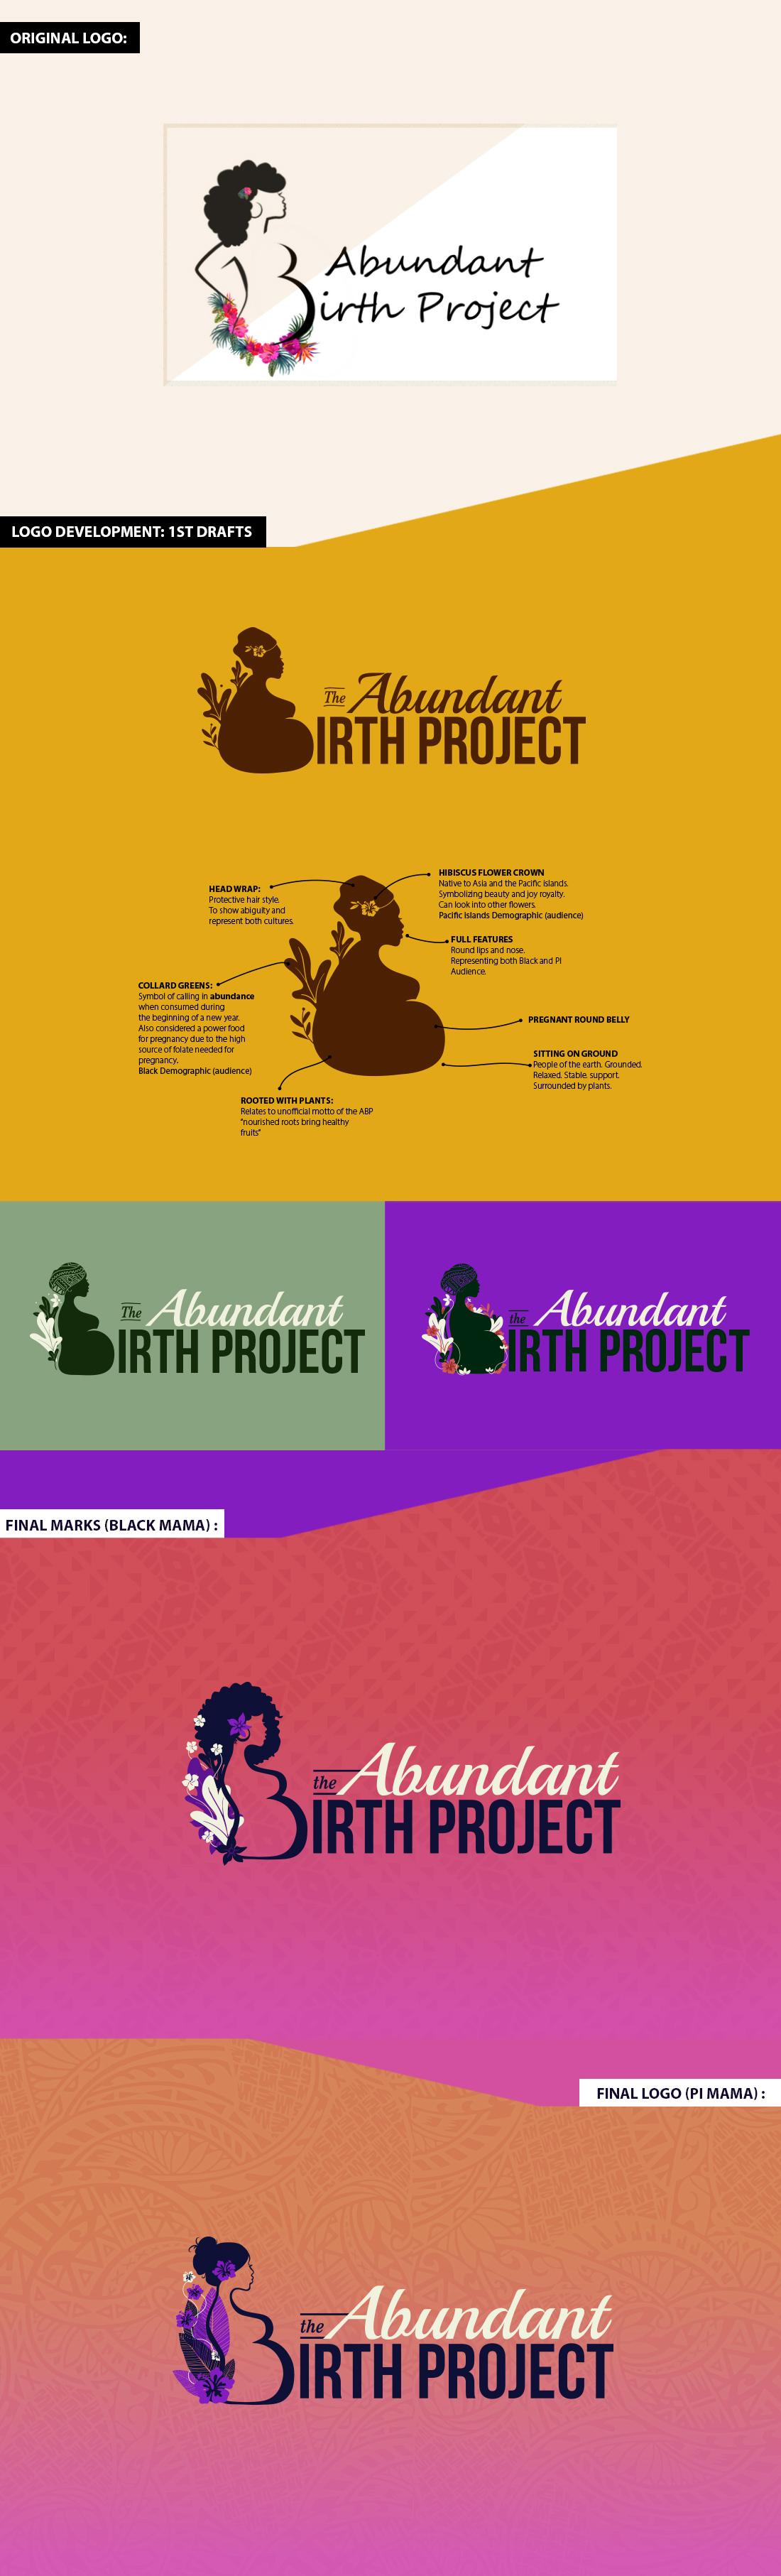 Logo Designer, Logo, Graphic Designer, Black Graphic Designer, Gay artist, Logo Development, branding, birth logo, pregnancy graphic, Silohuette